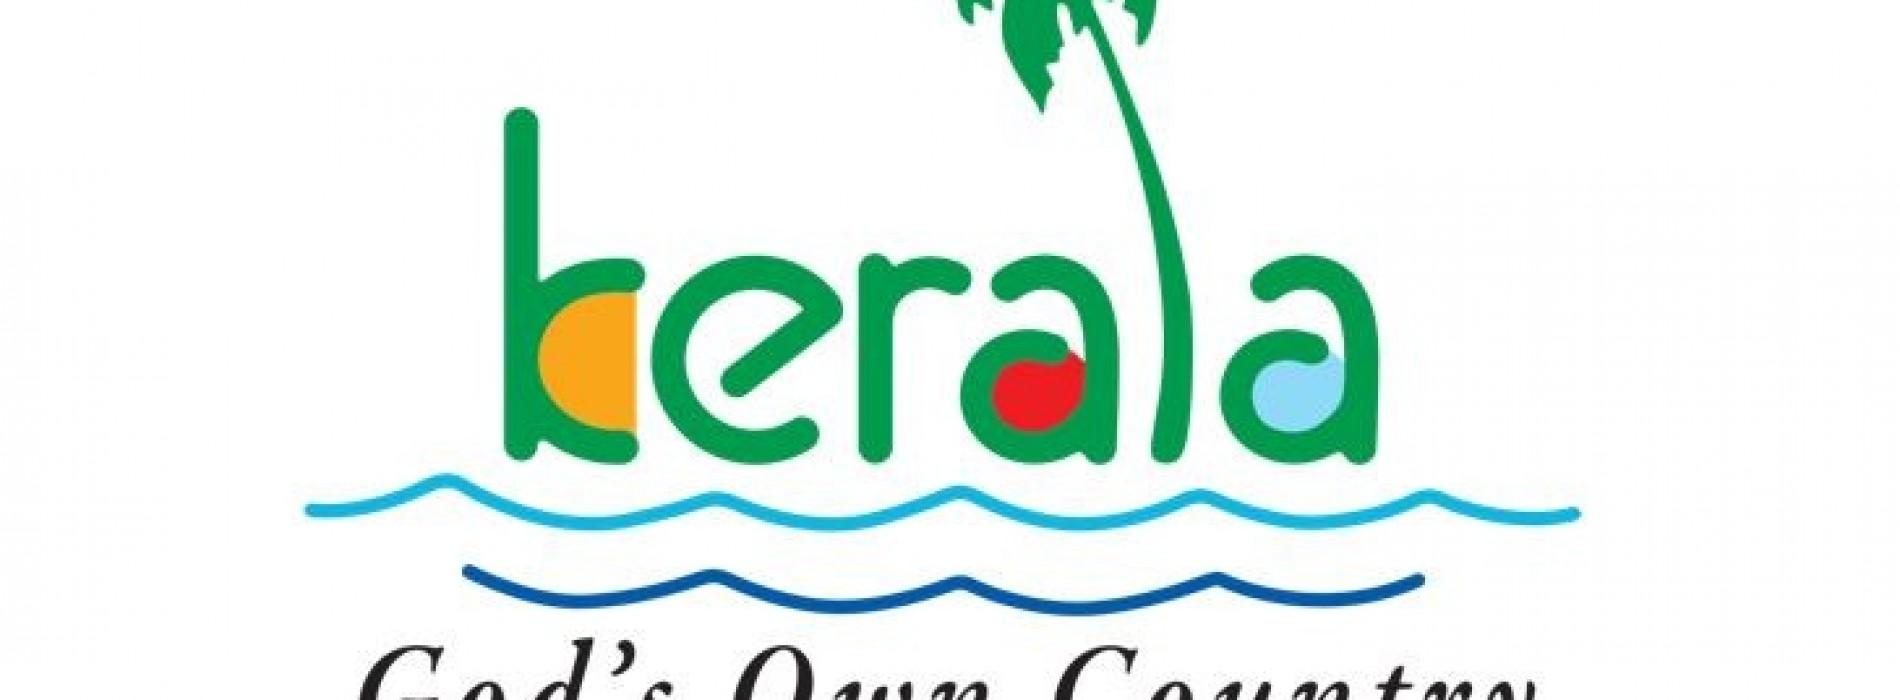 Kerala CM launches the ambitious Malanad-Malabar project